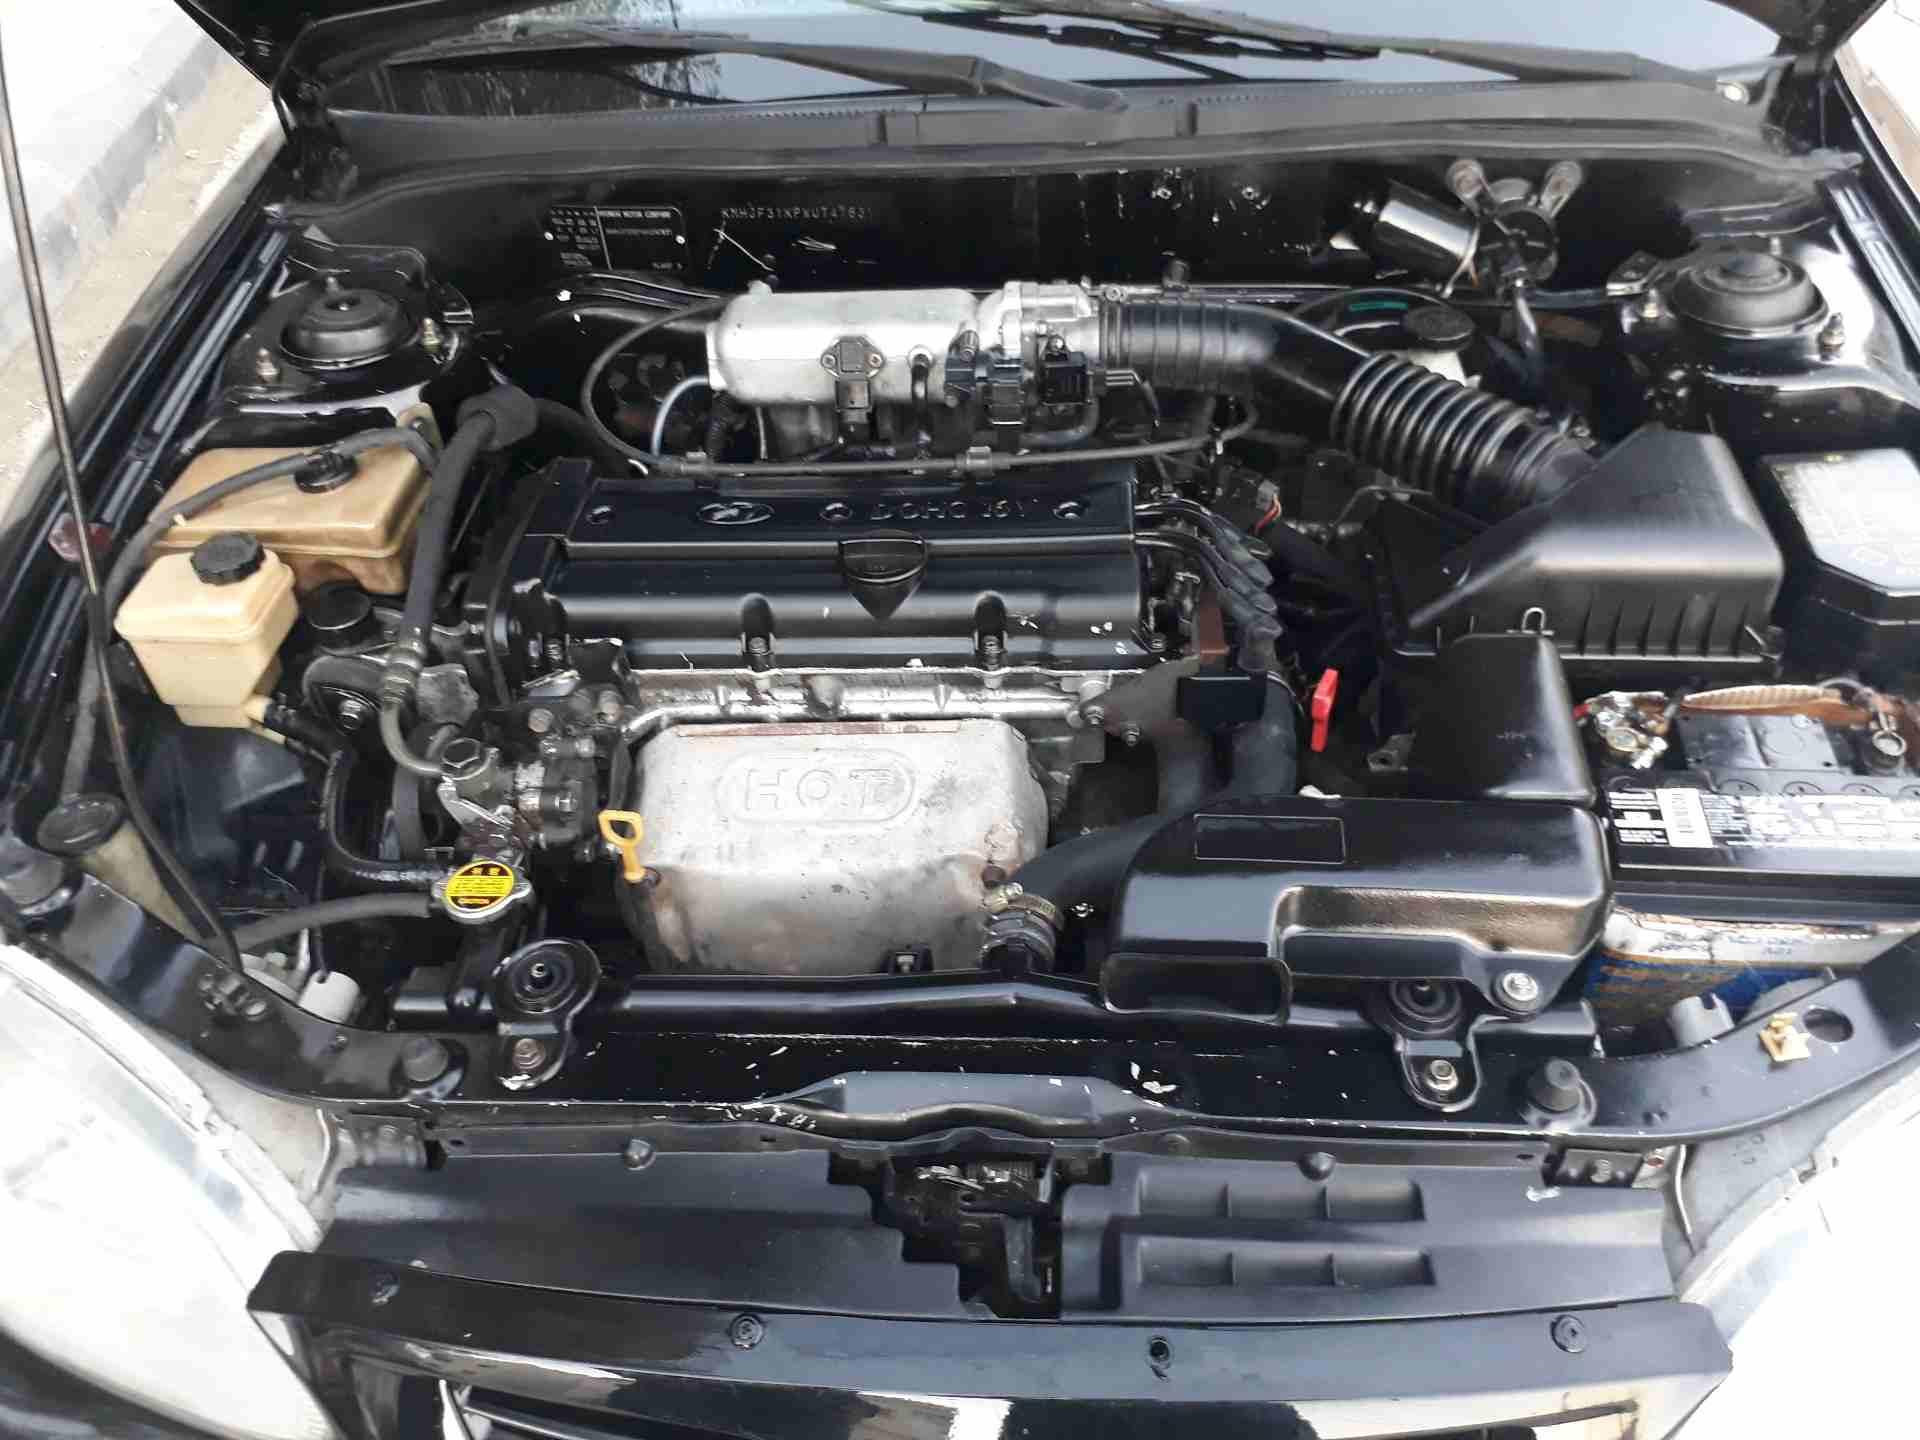 2020 Lexus LX 570 4WDSUV w/ 3rd Row & Luxury Full option Petrol . 8 CYLINDERSwhatsapp +13524406723Email---bdfarihaeva@gmail.com-  هونداي افانتي 98 اتوماتيك...